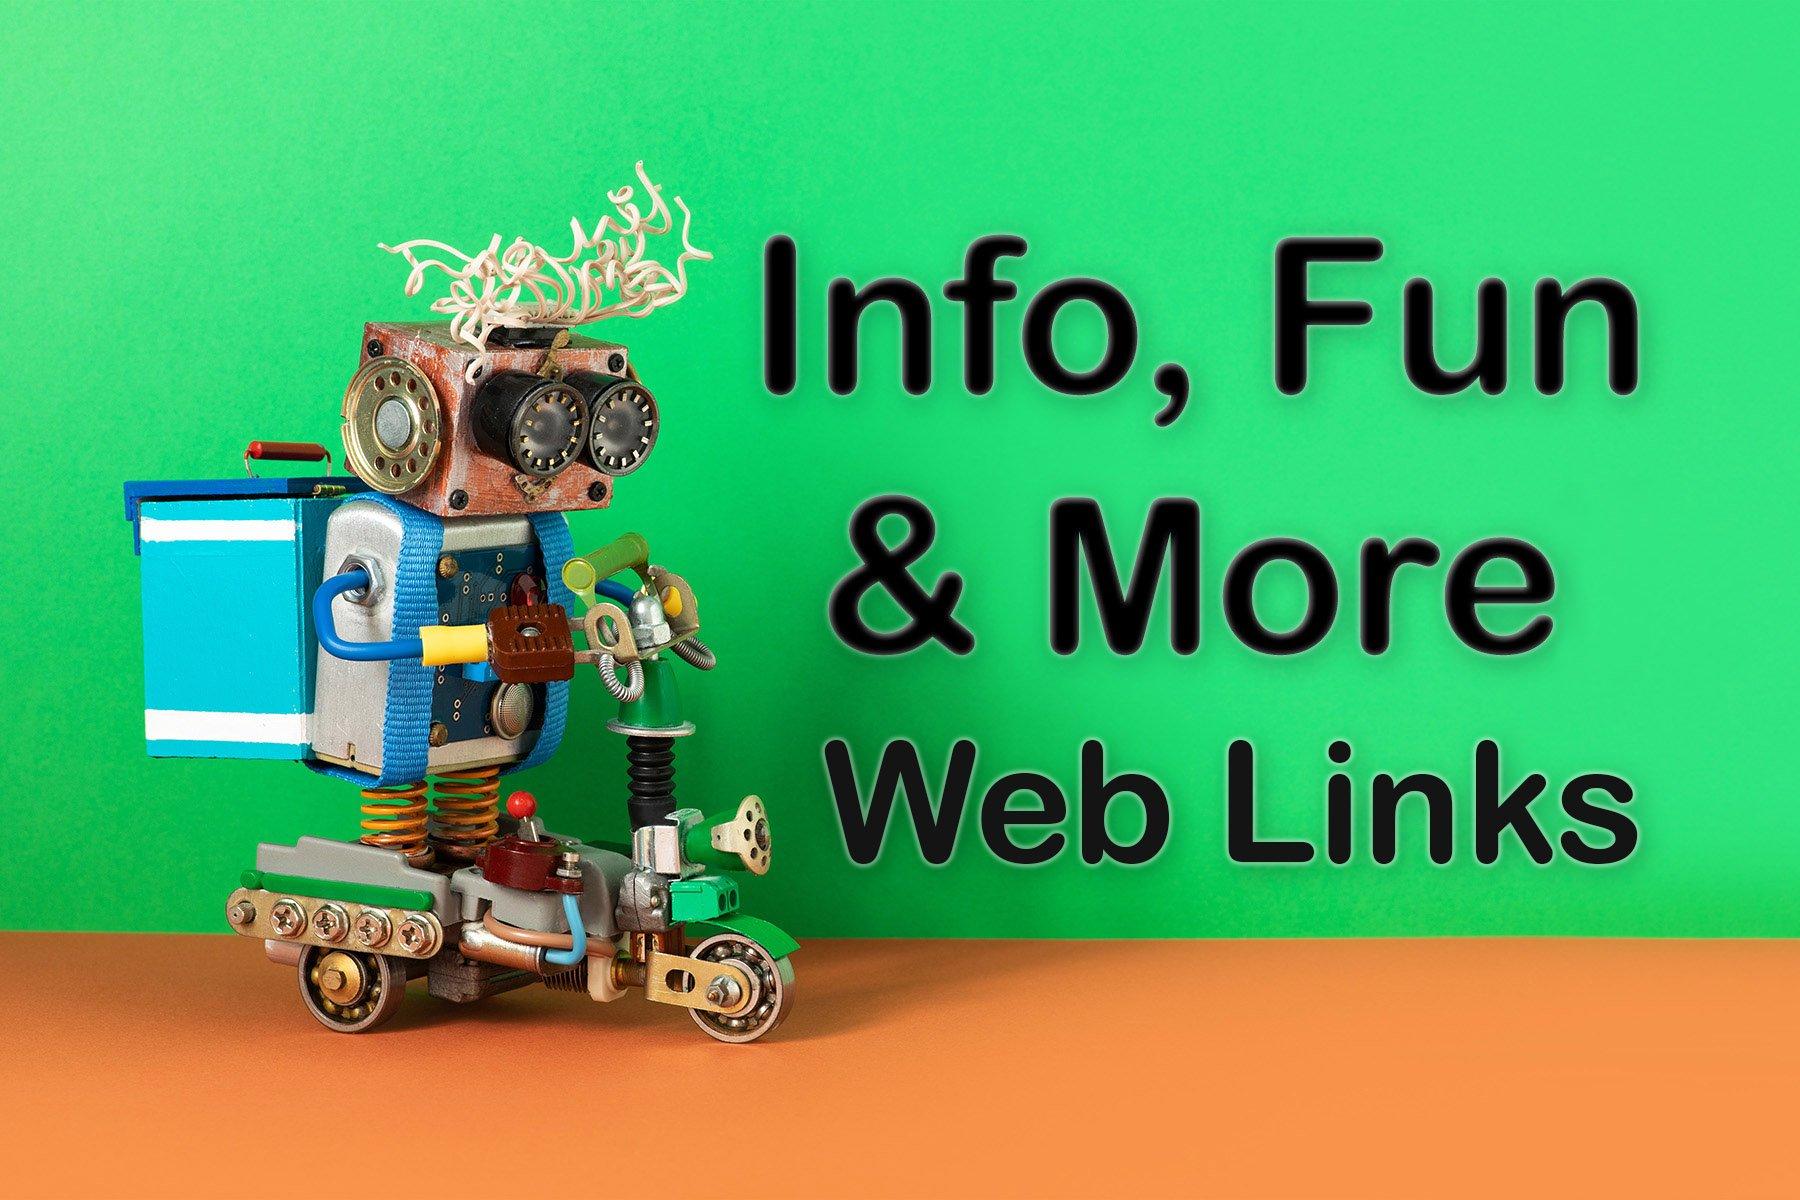 Info, Fun & More Web Links